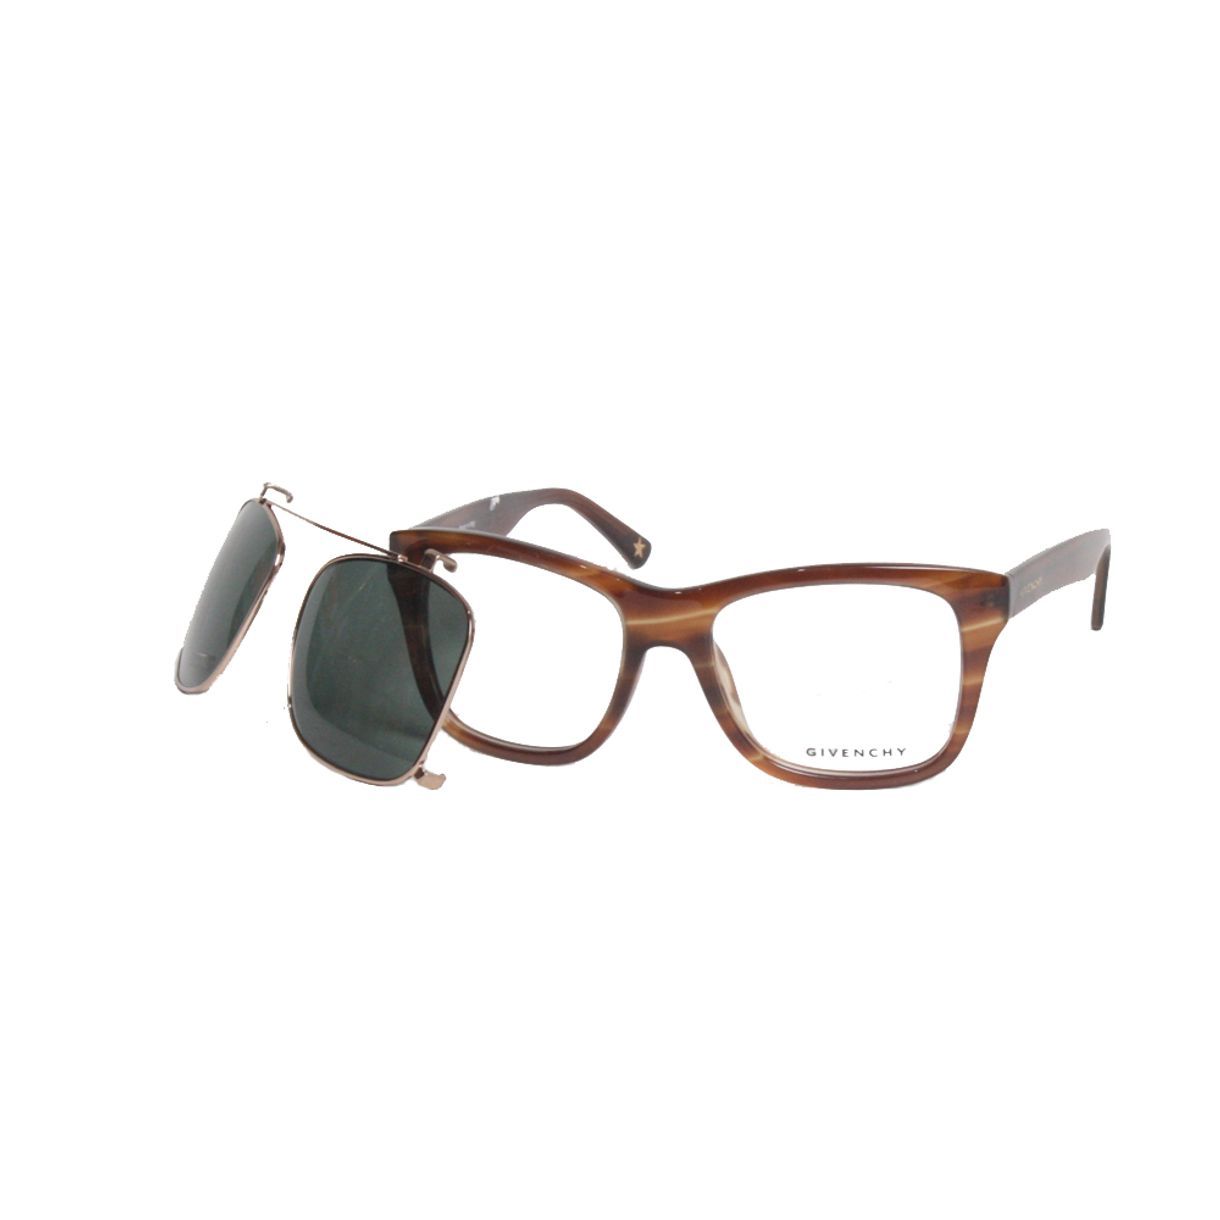 Oculos-Givenchy-Clip-On